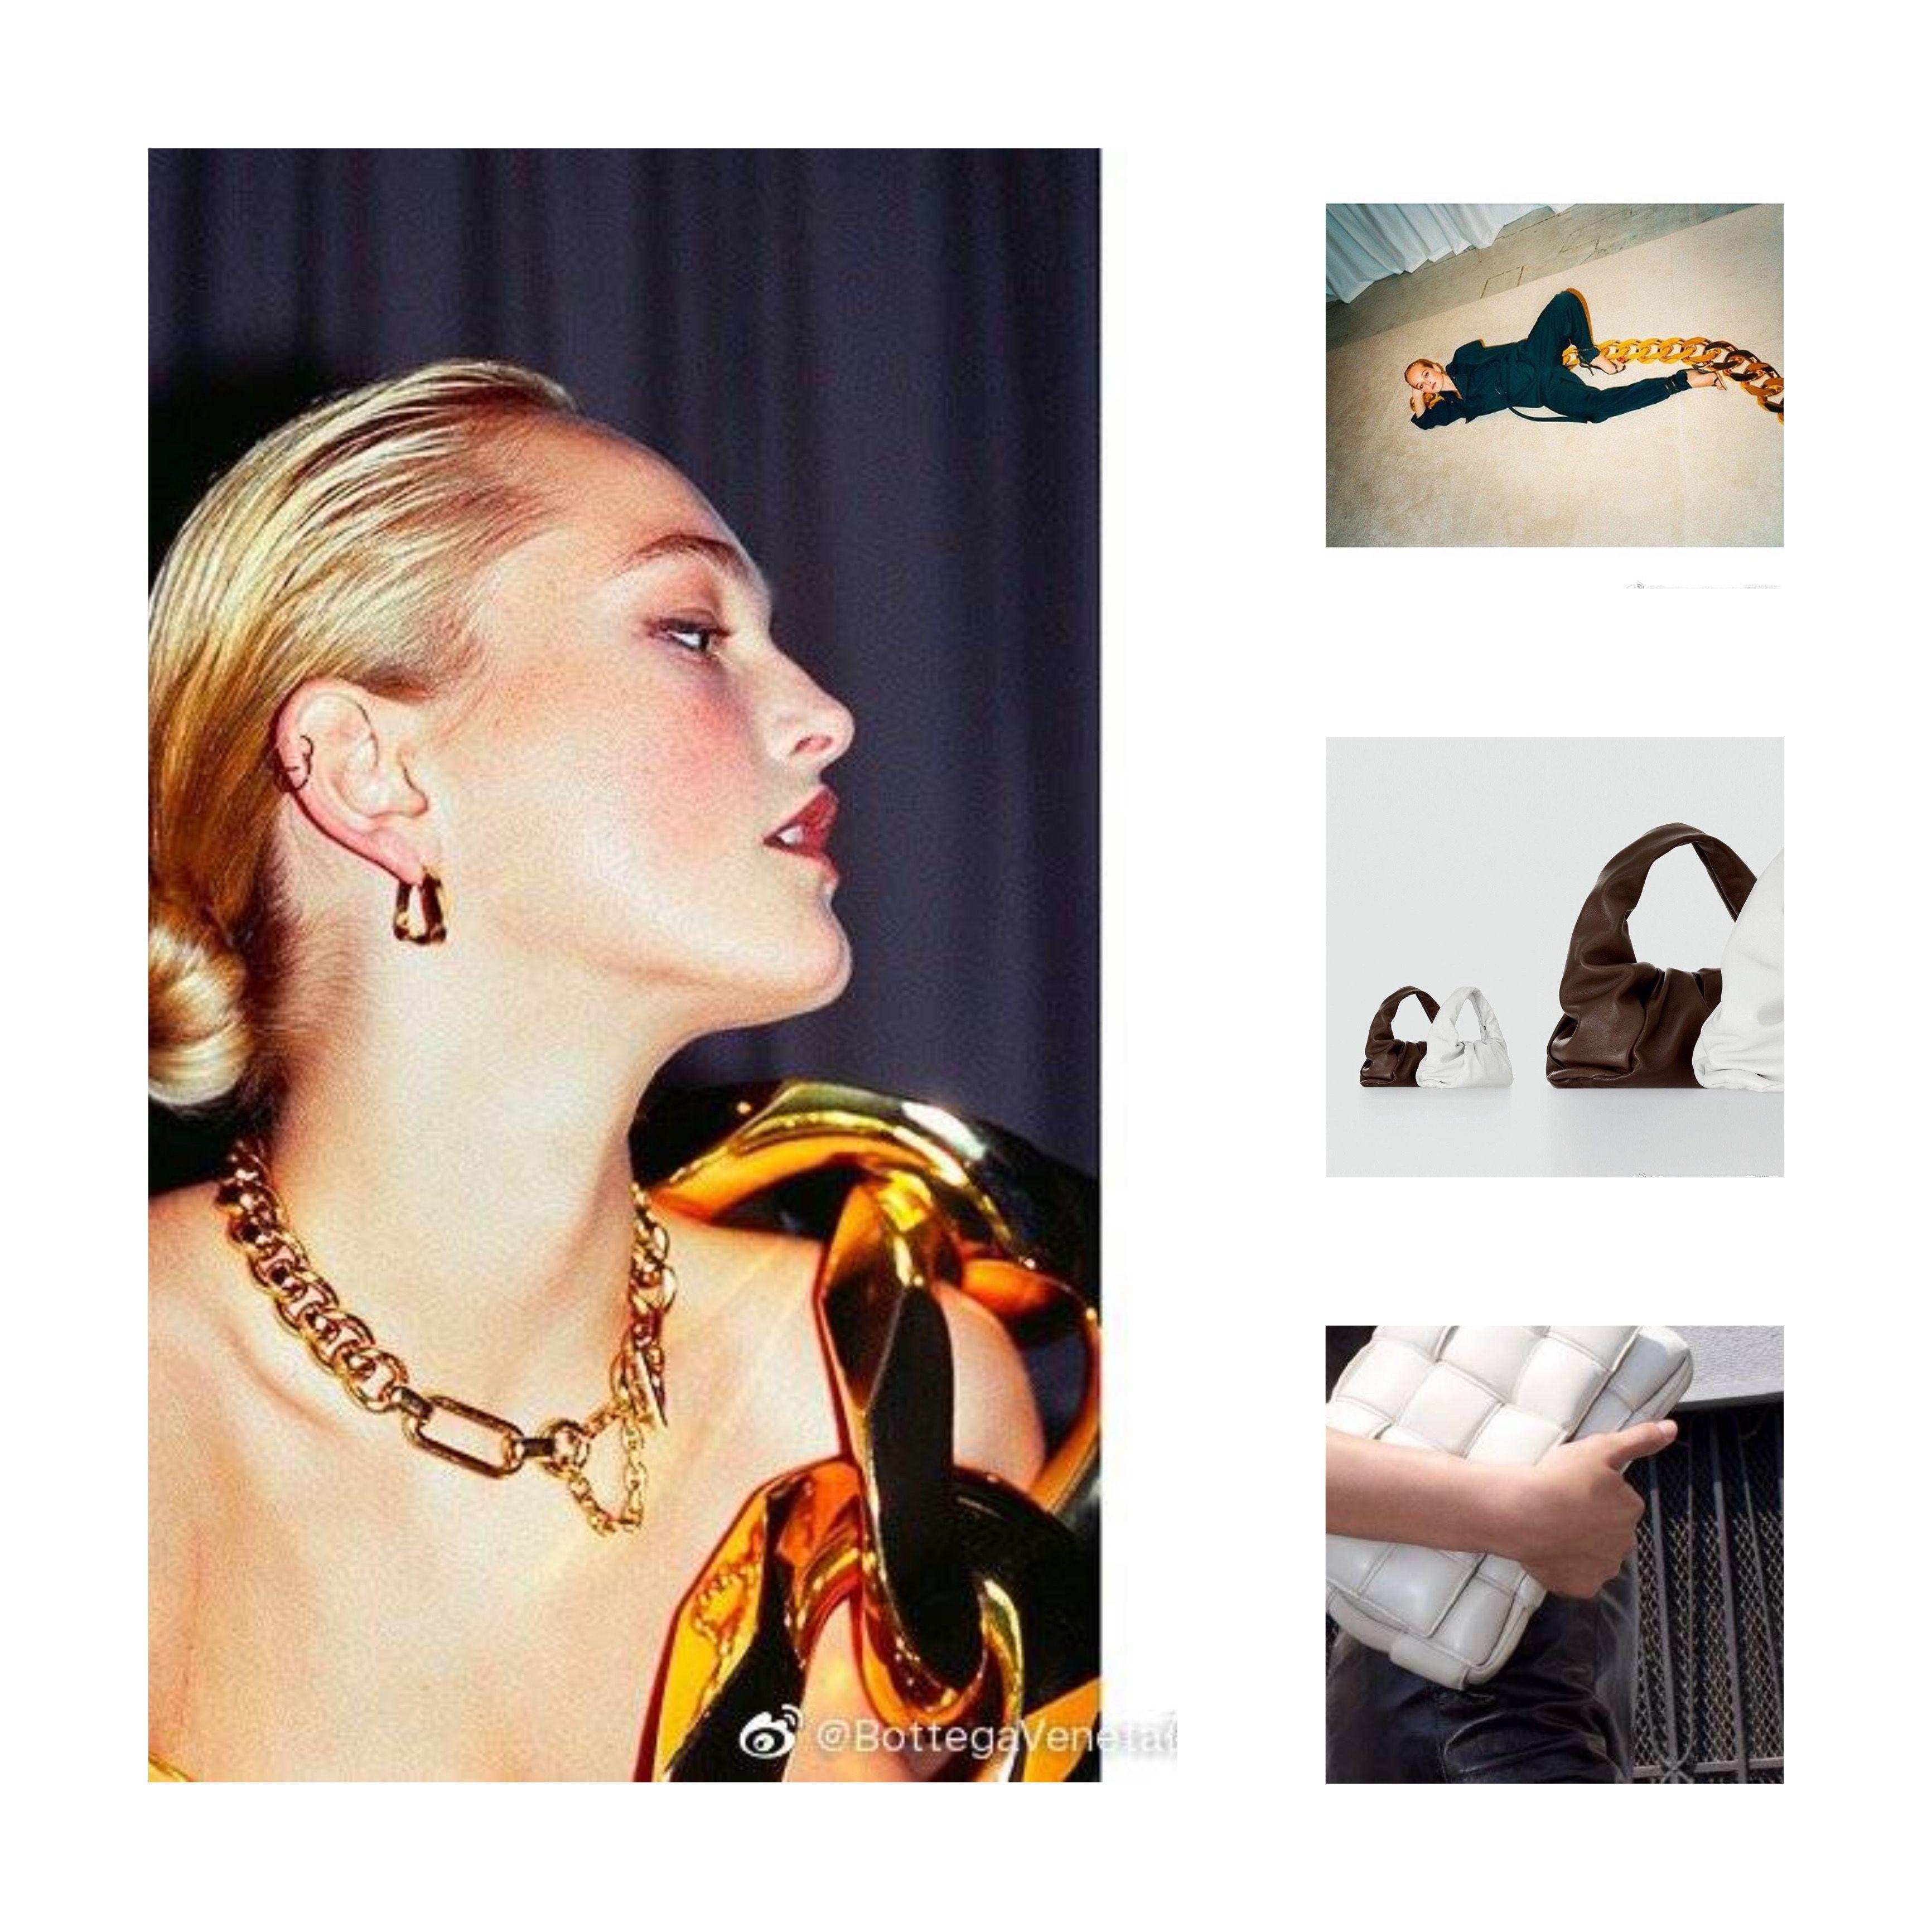 Bottega Veneta获英国时尚大奖年度品牌奖